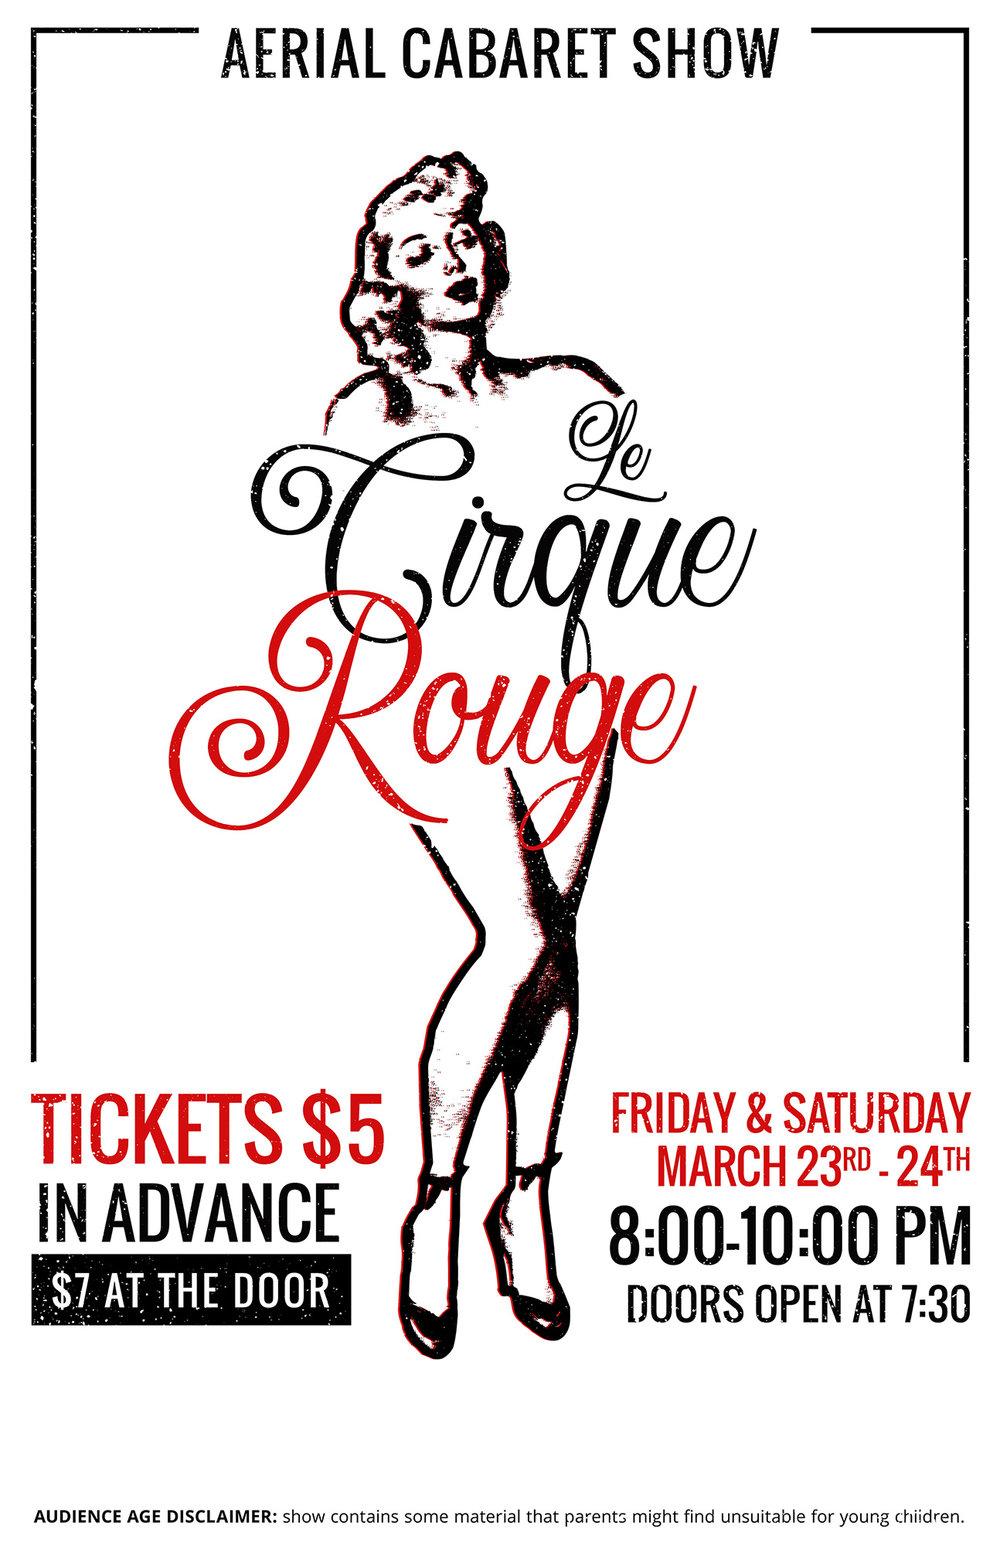 Le-Cirque-Rouge-SkyJam-Poster.jpg